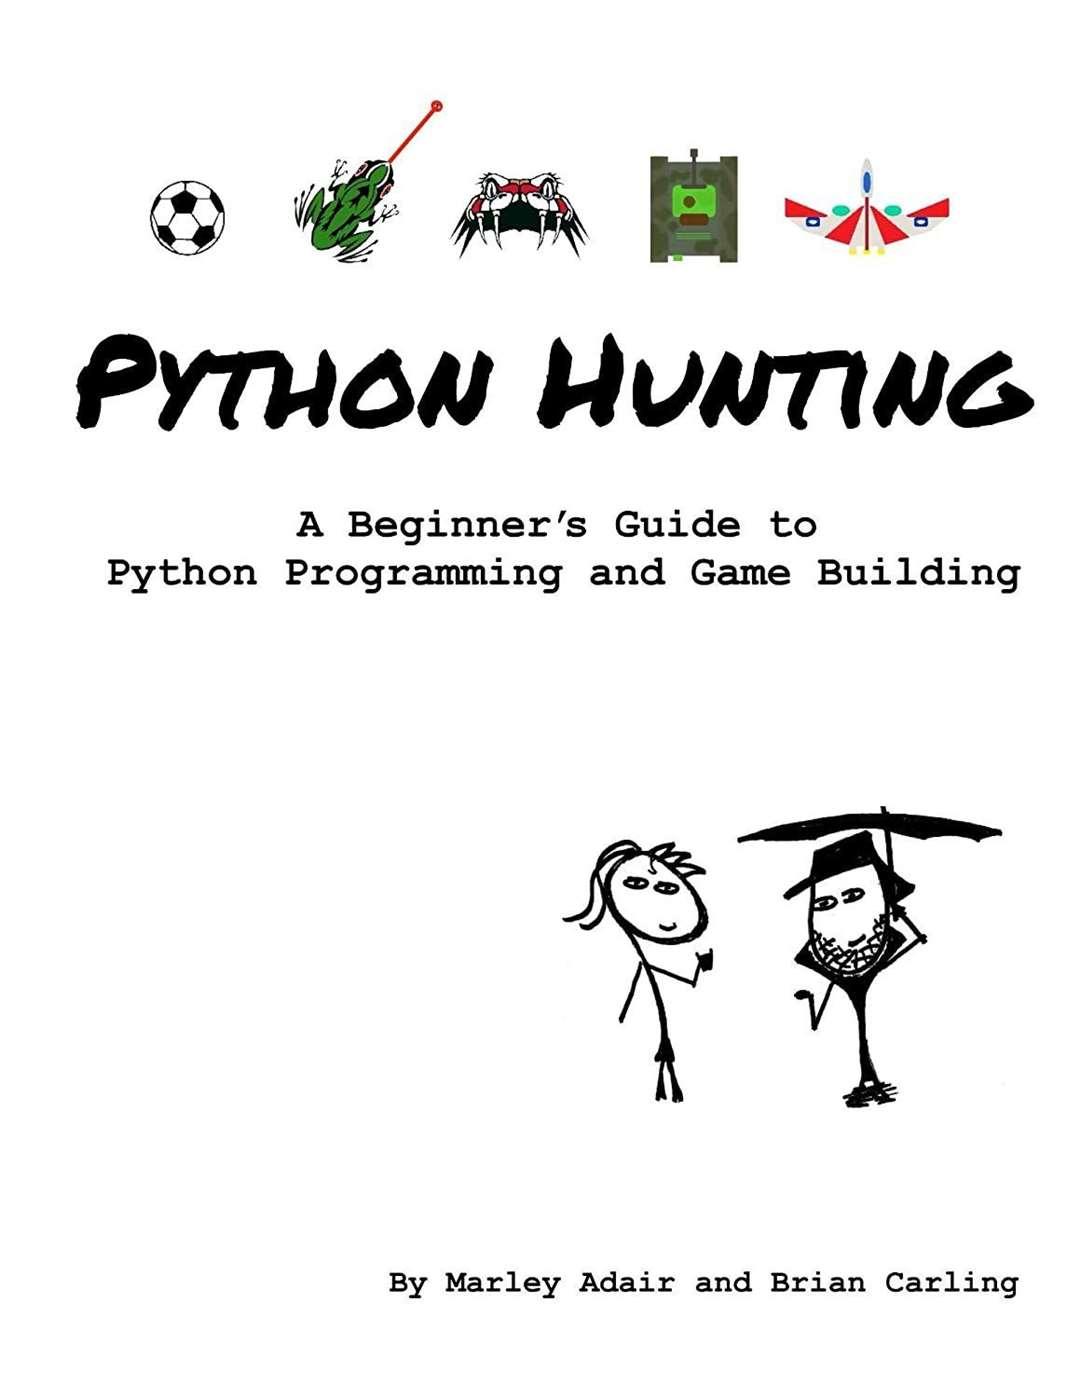 Chasse au python par Brian Carling et Mary Adair (43297291)